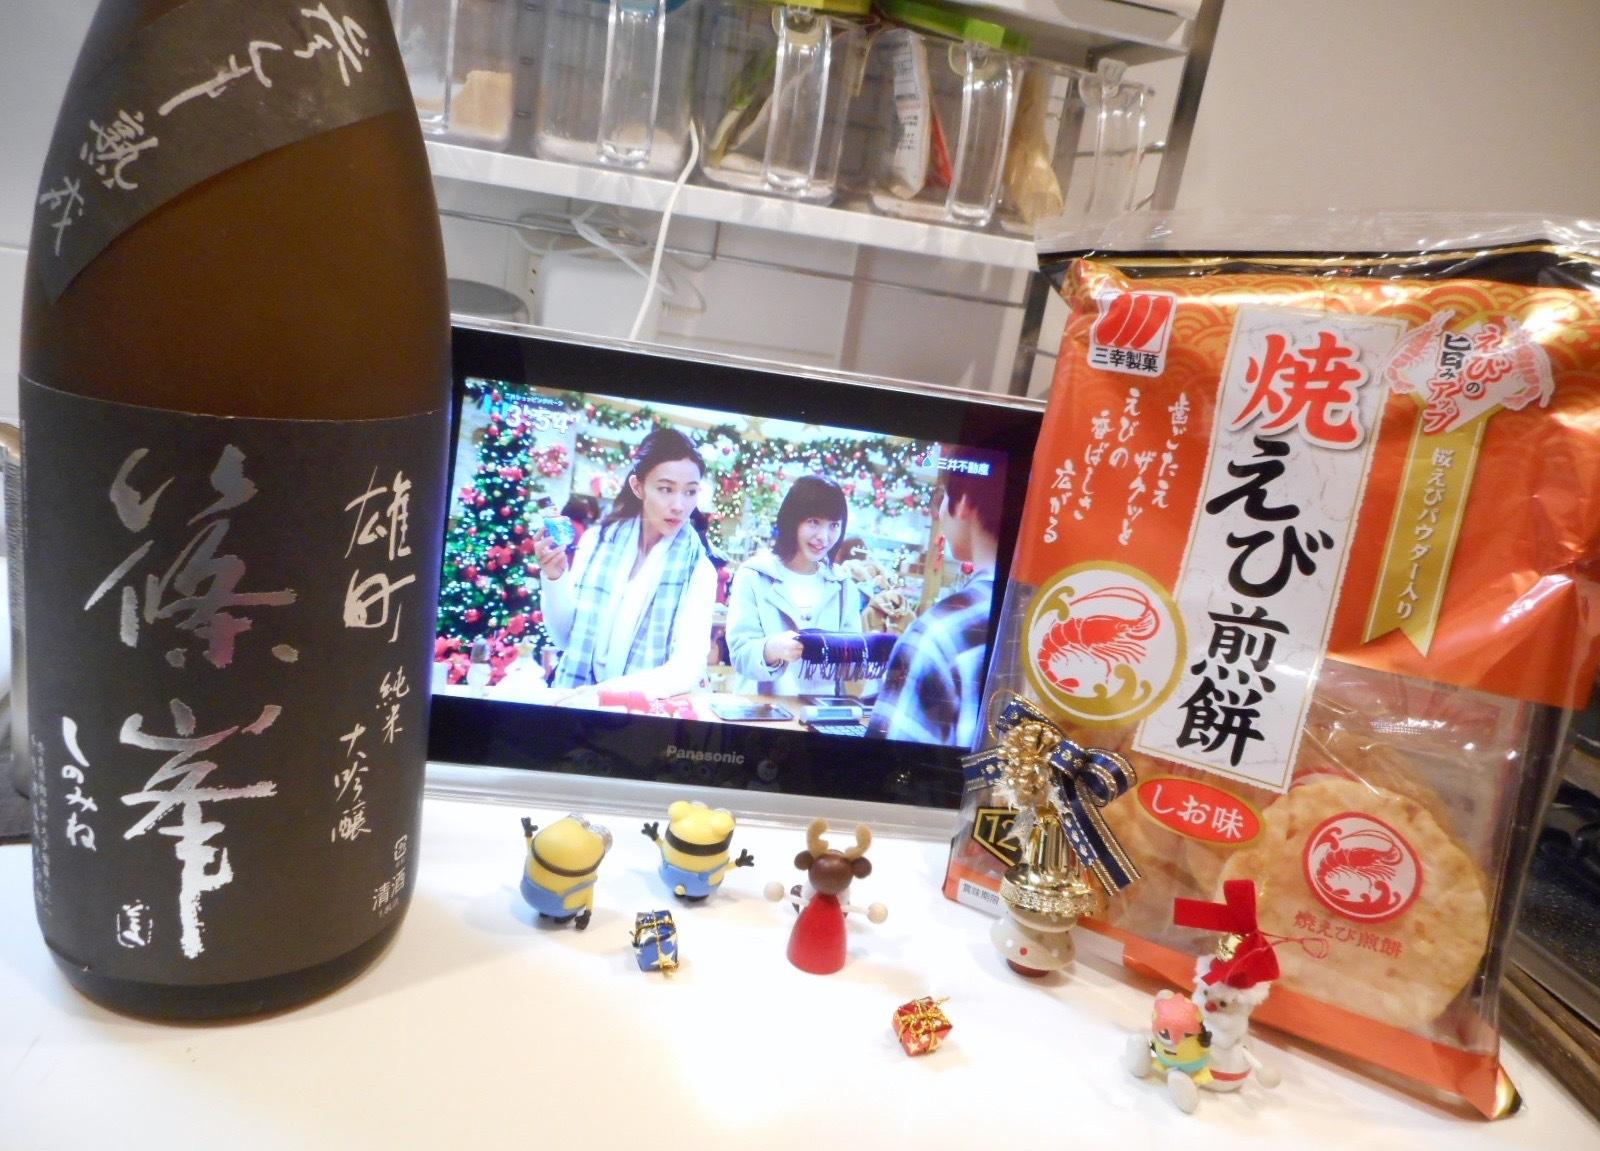 shinomine_jundai_omachi_sannen25by1_1.jpg